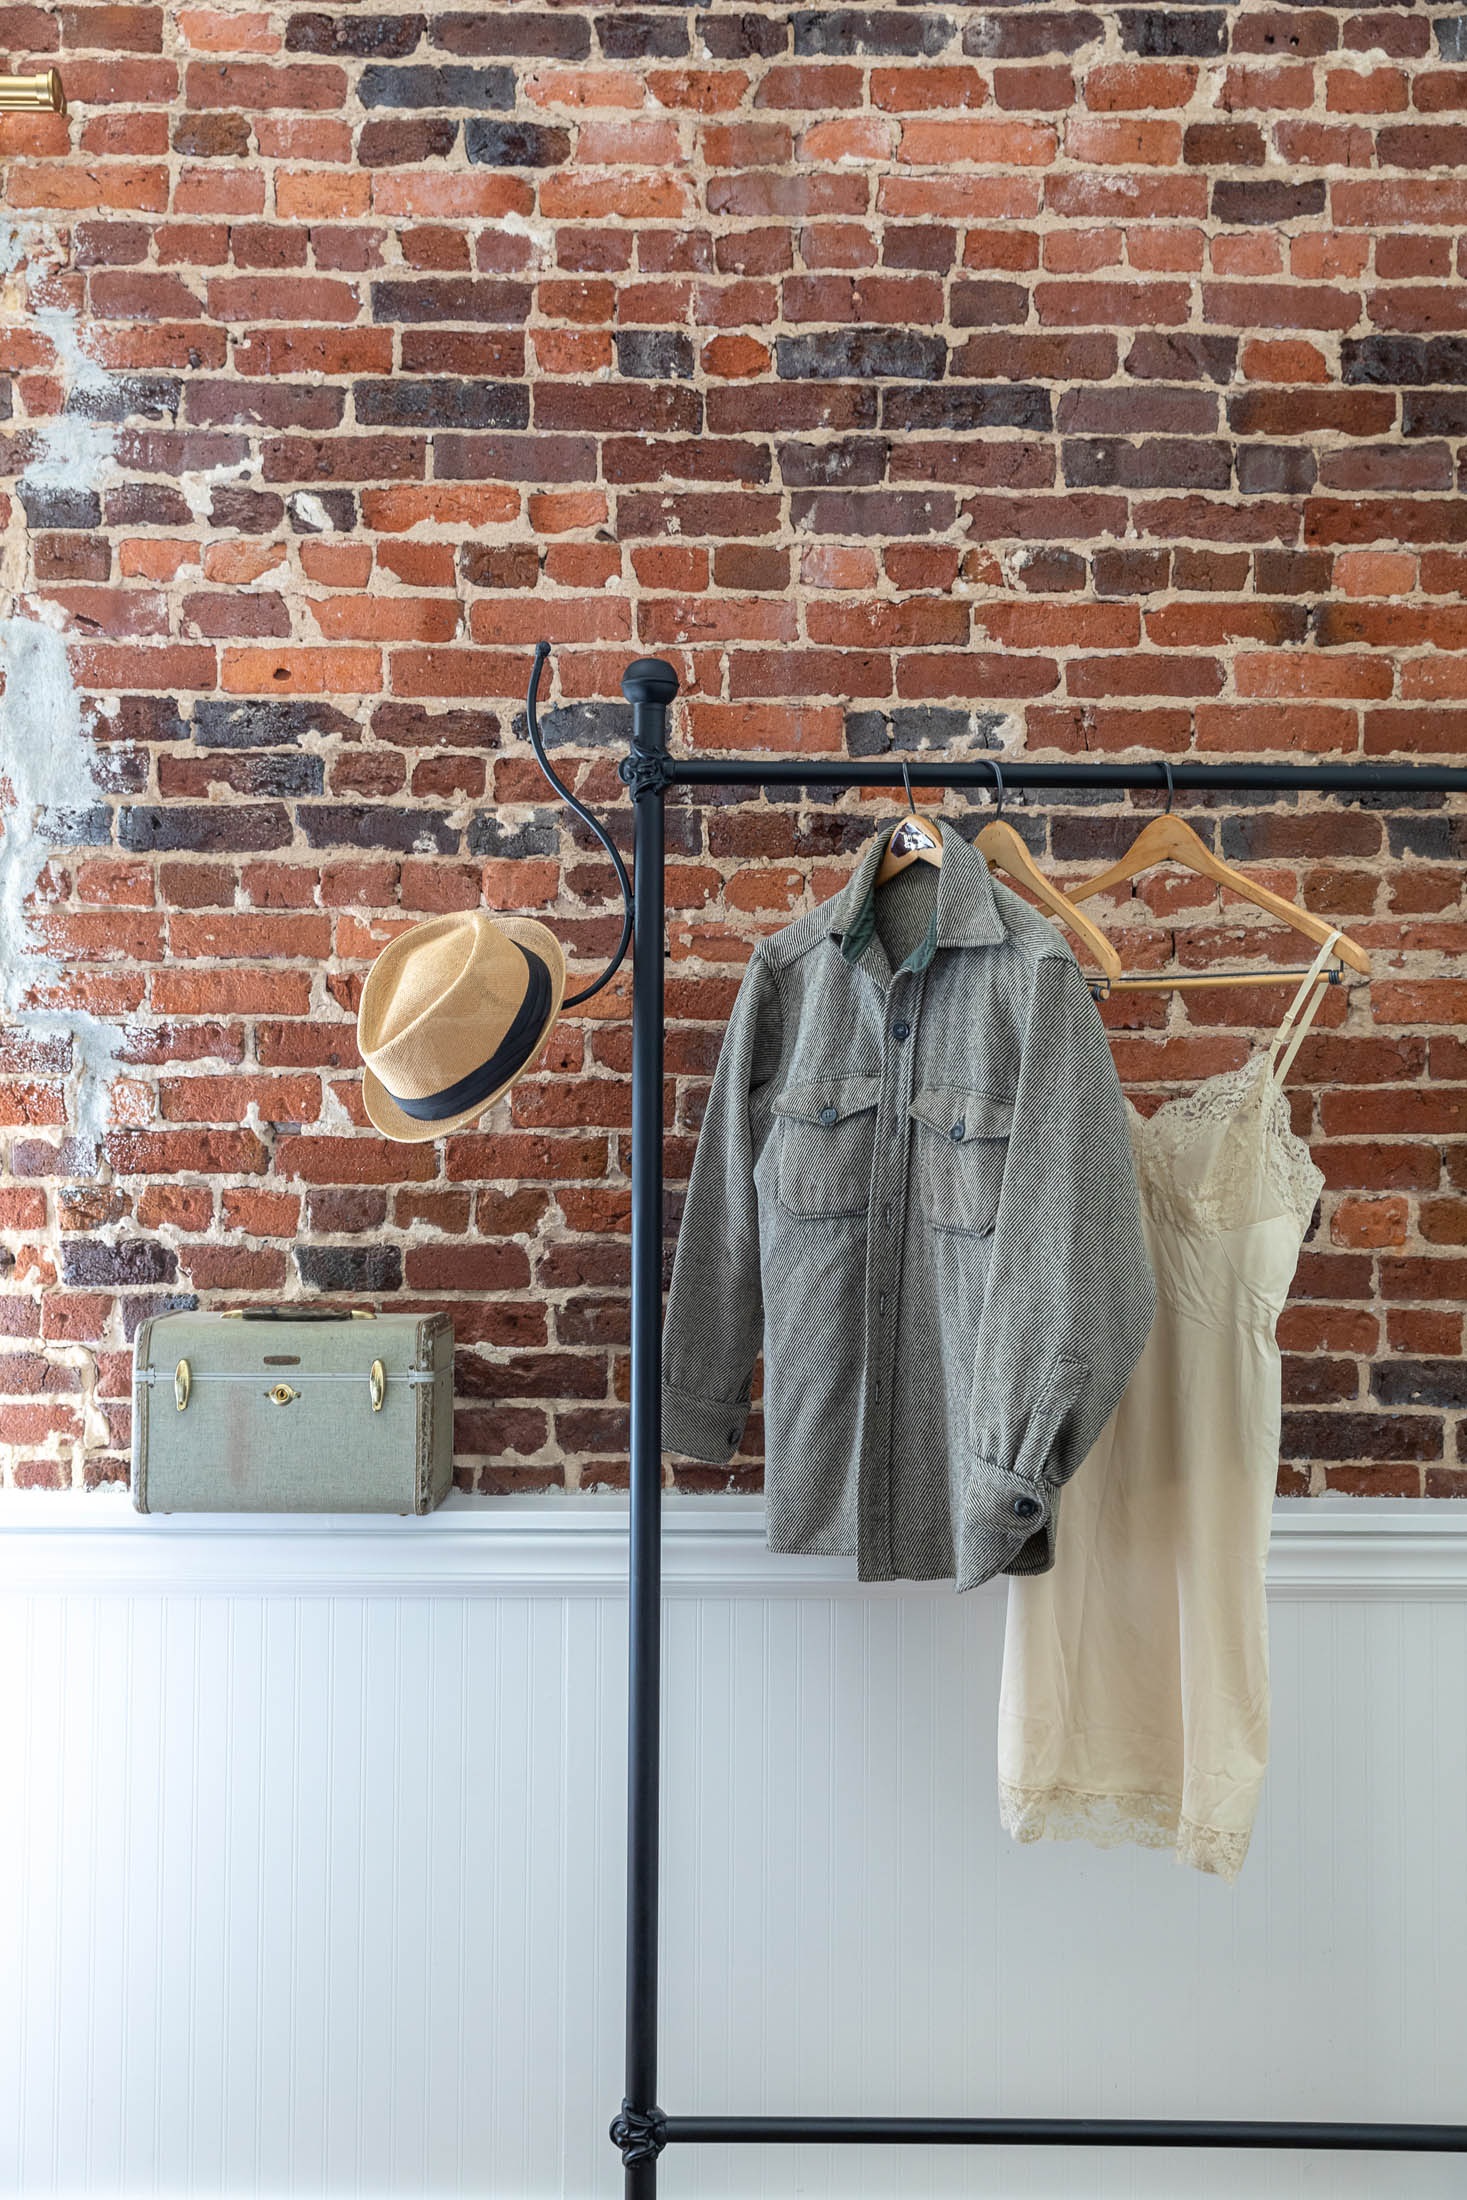 Brick Wall and Clothesrack